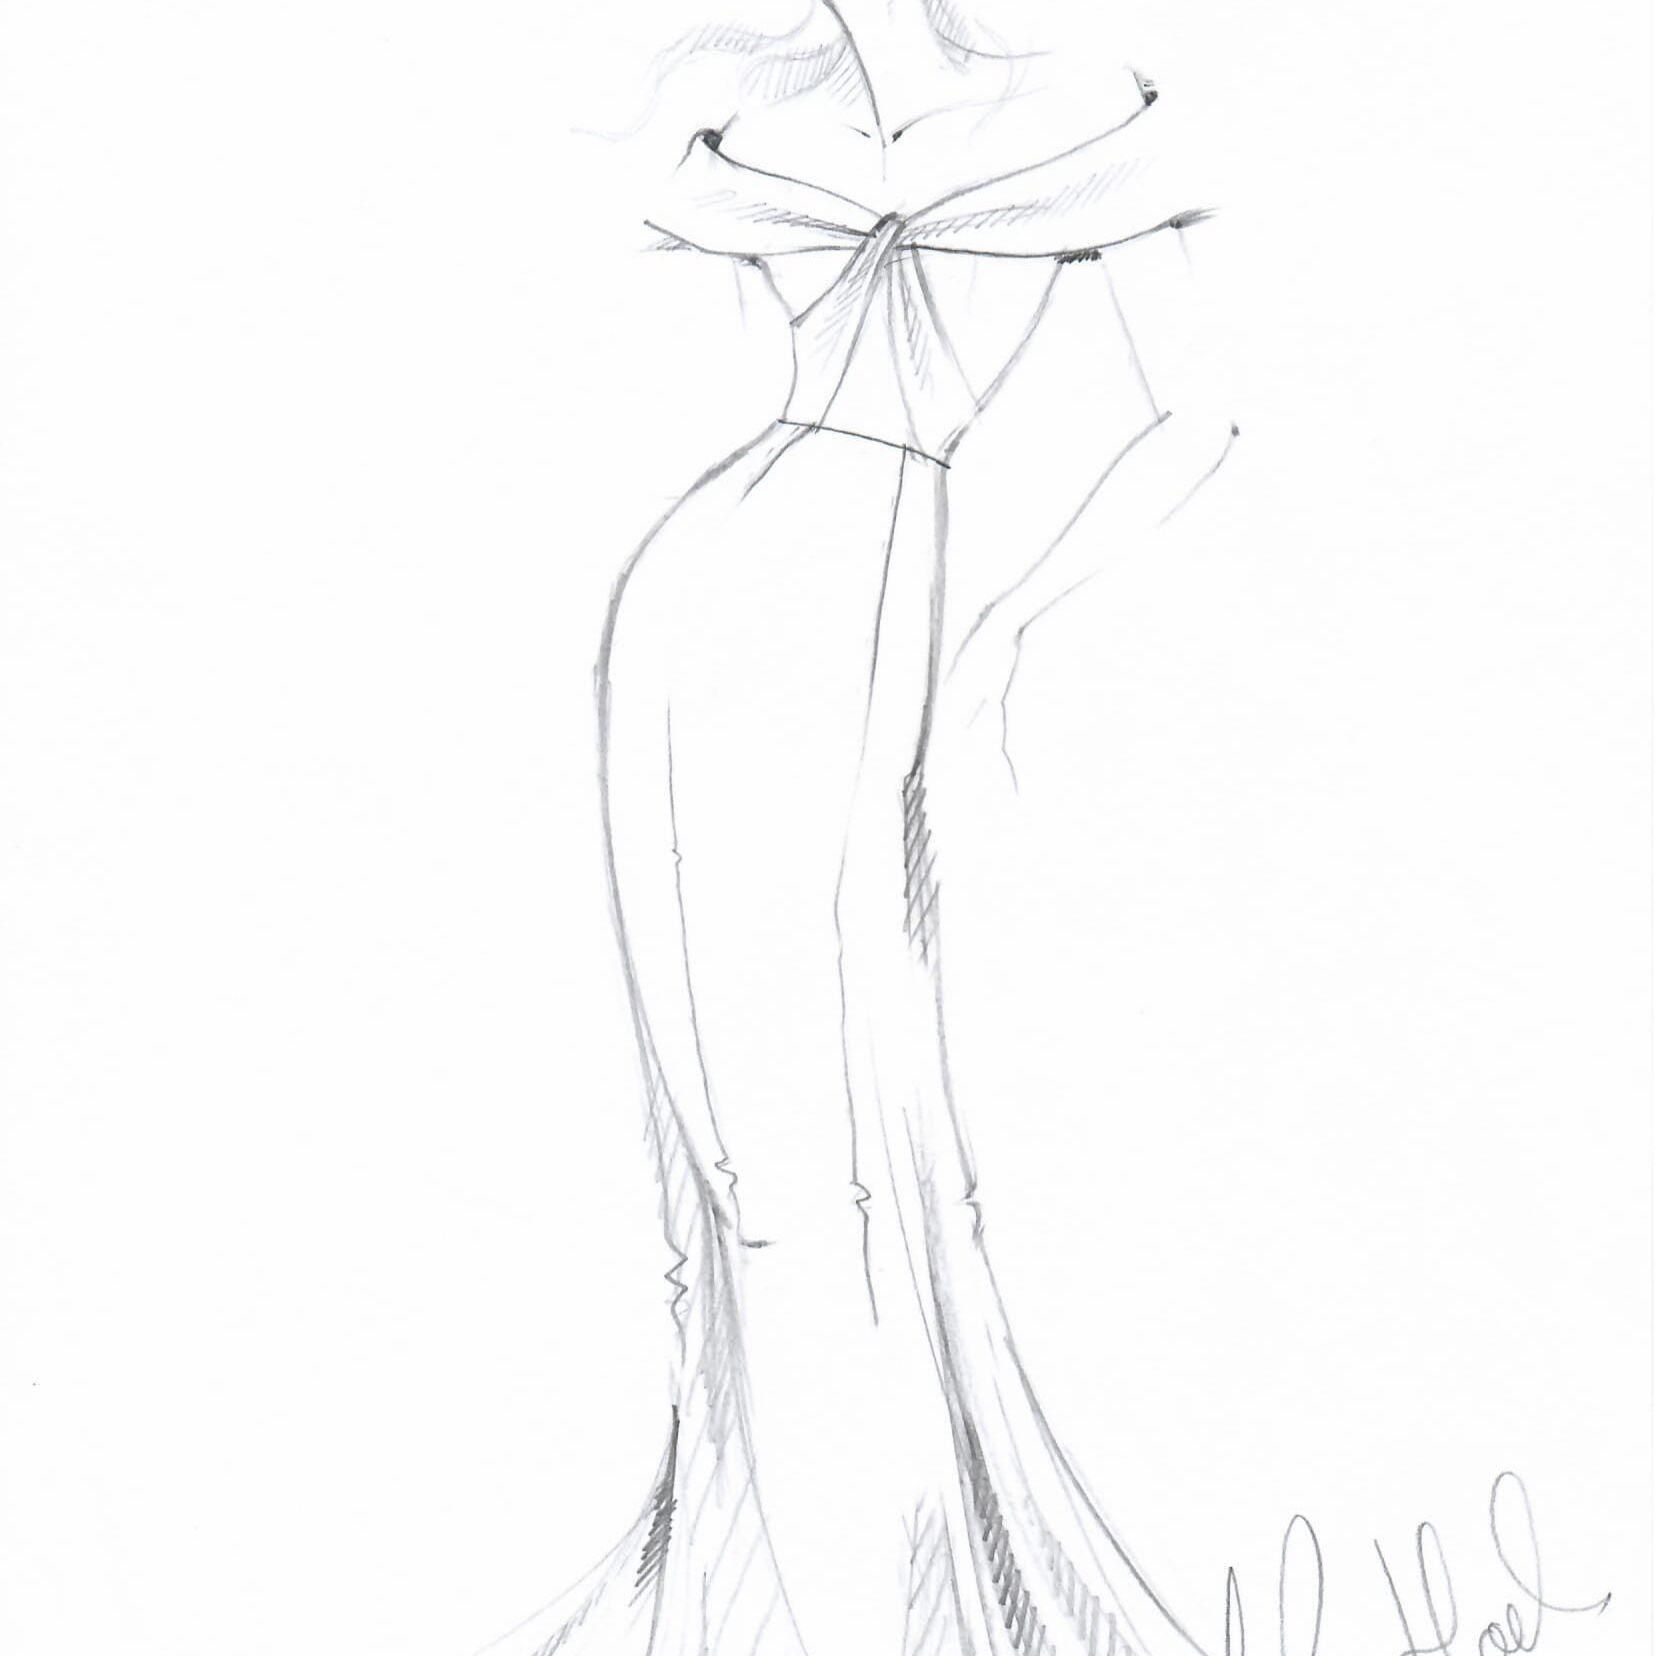 Lihi Hod sketches